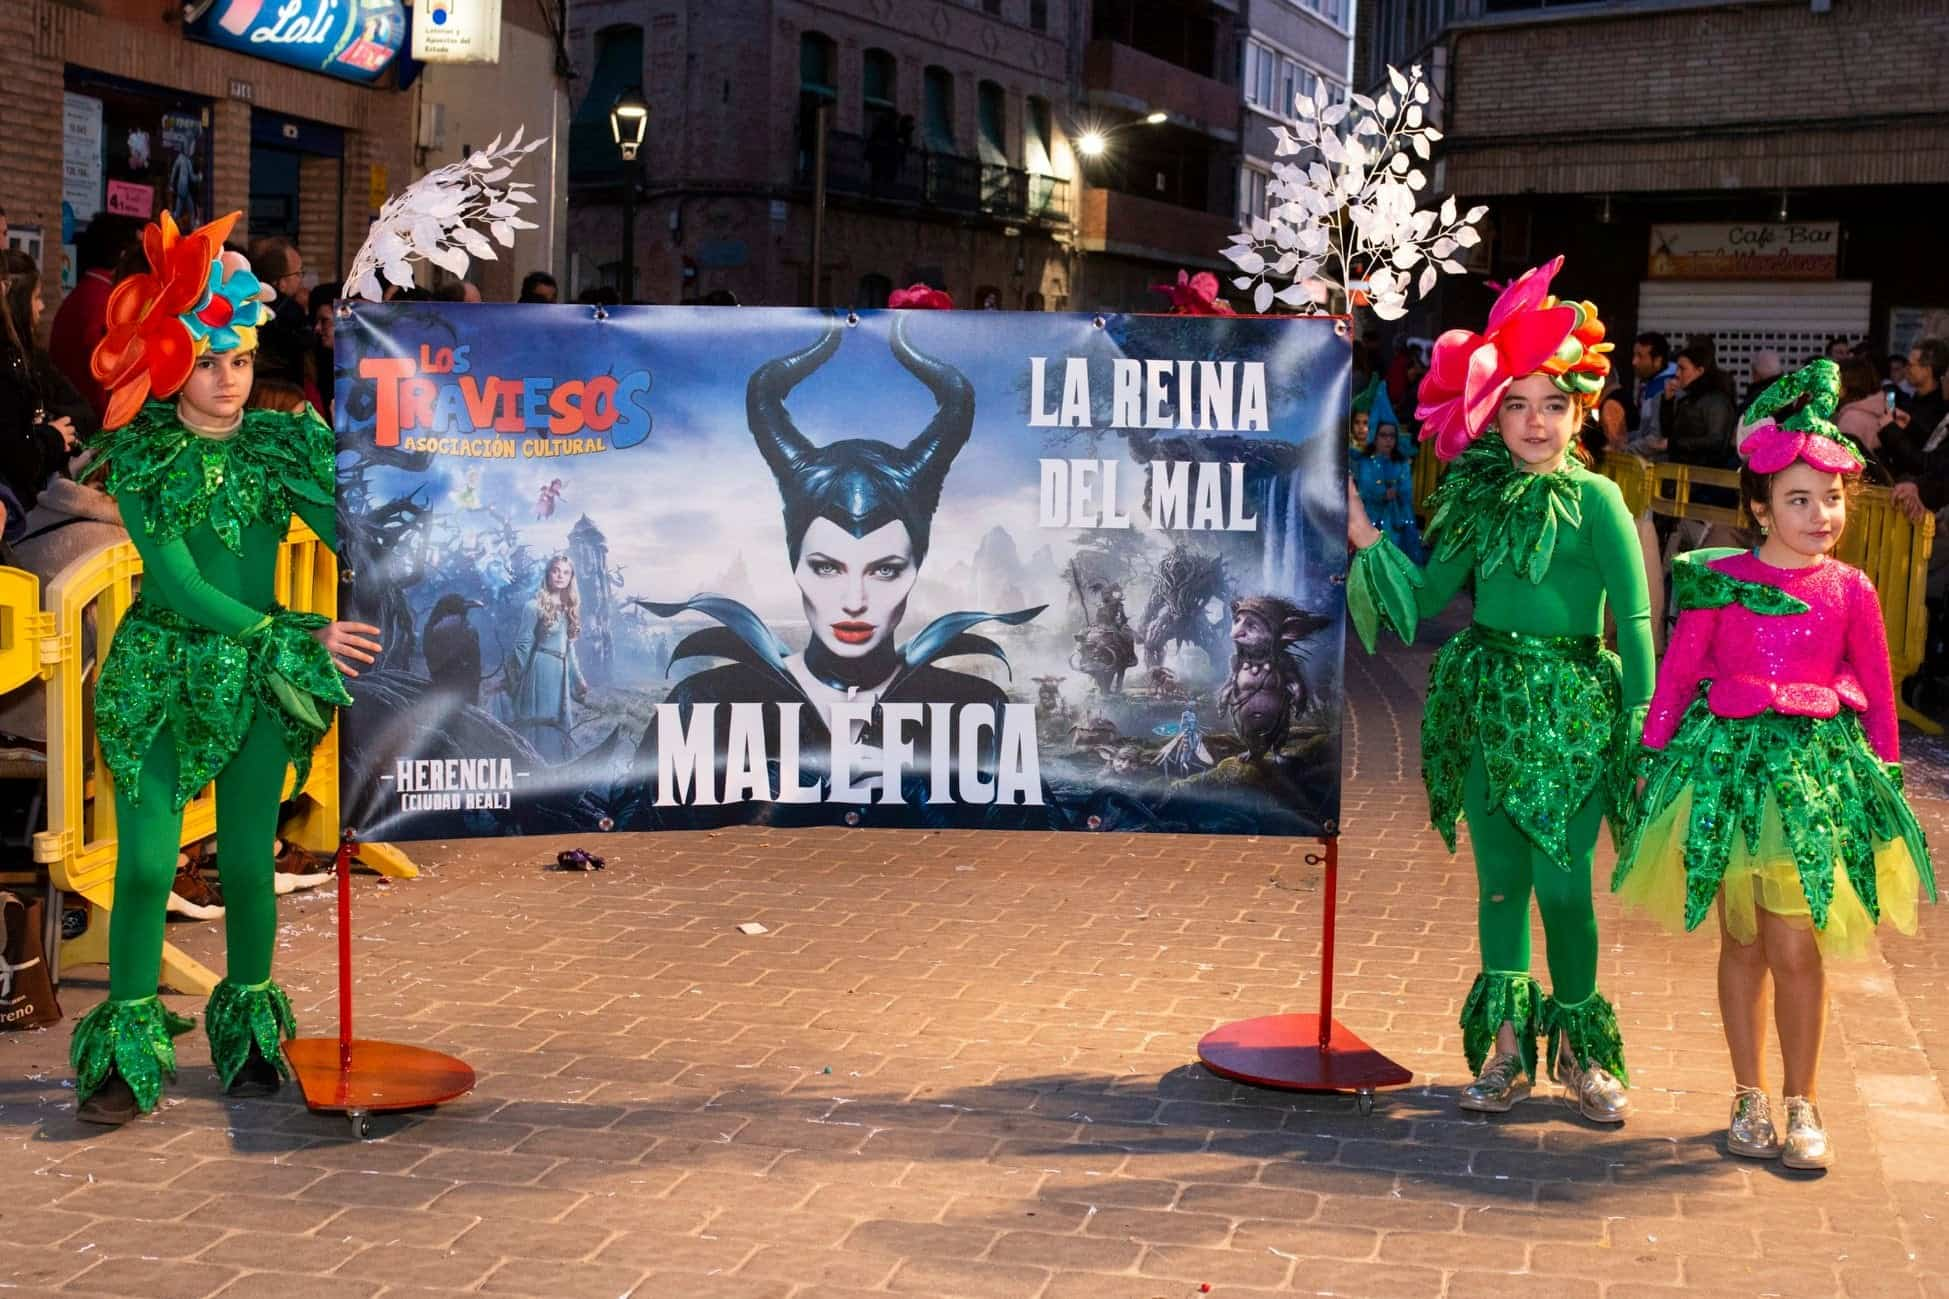 Carnaval de herencia 2020 ofertorio 104 - Selección de fotografías del Ofertorio del Carnaval de Herencia